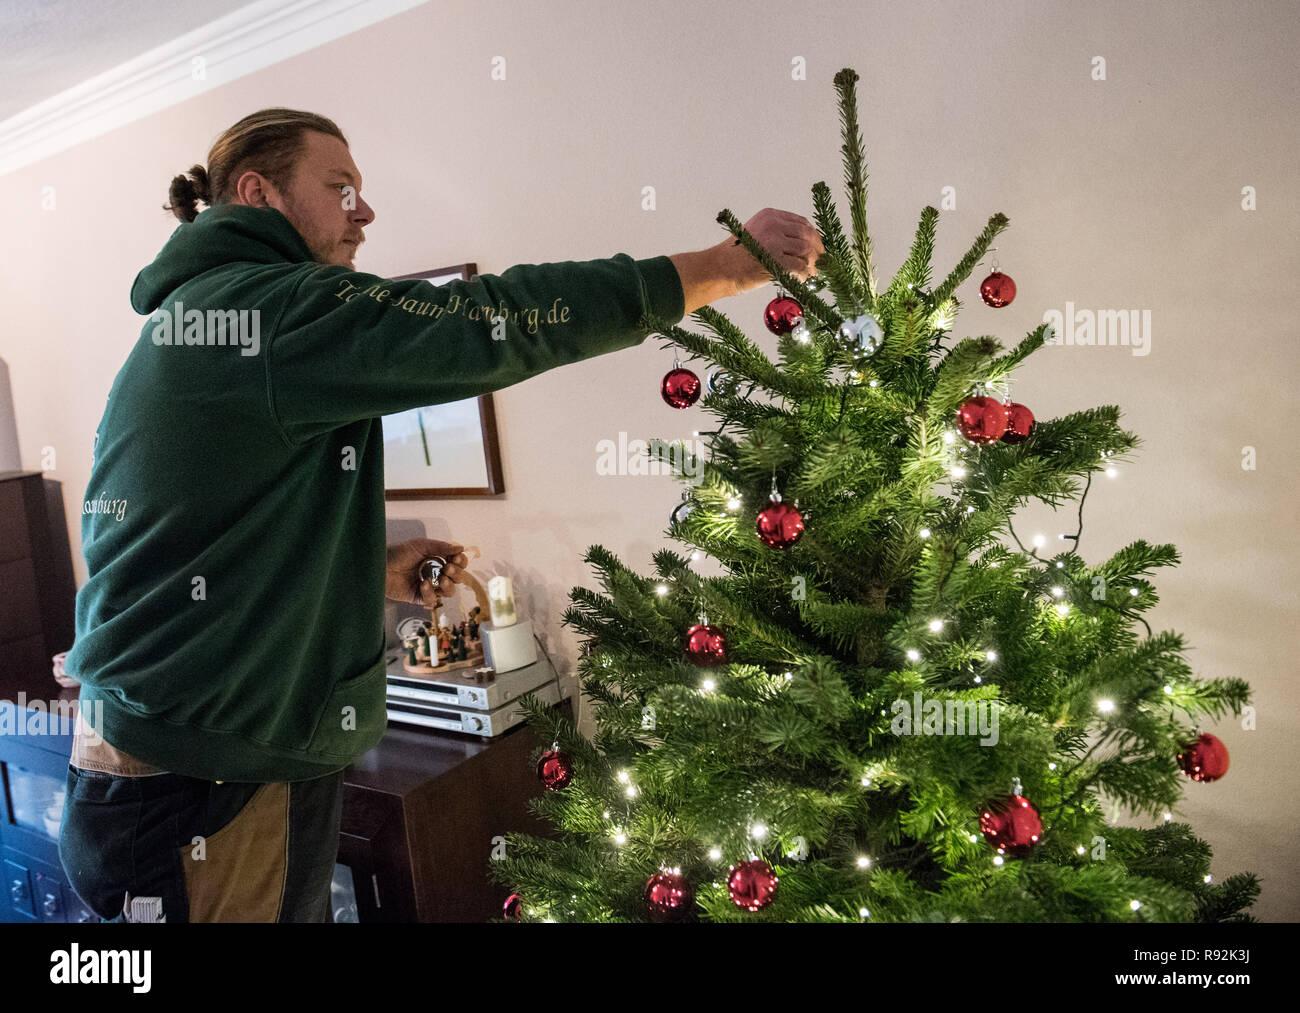 Hamburg Germany 17th Dec 2018 Gianni Kunstmann A Christmas Tree